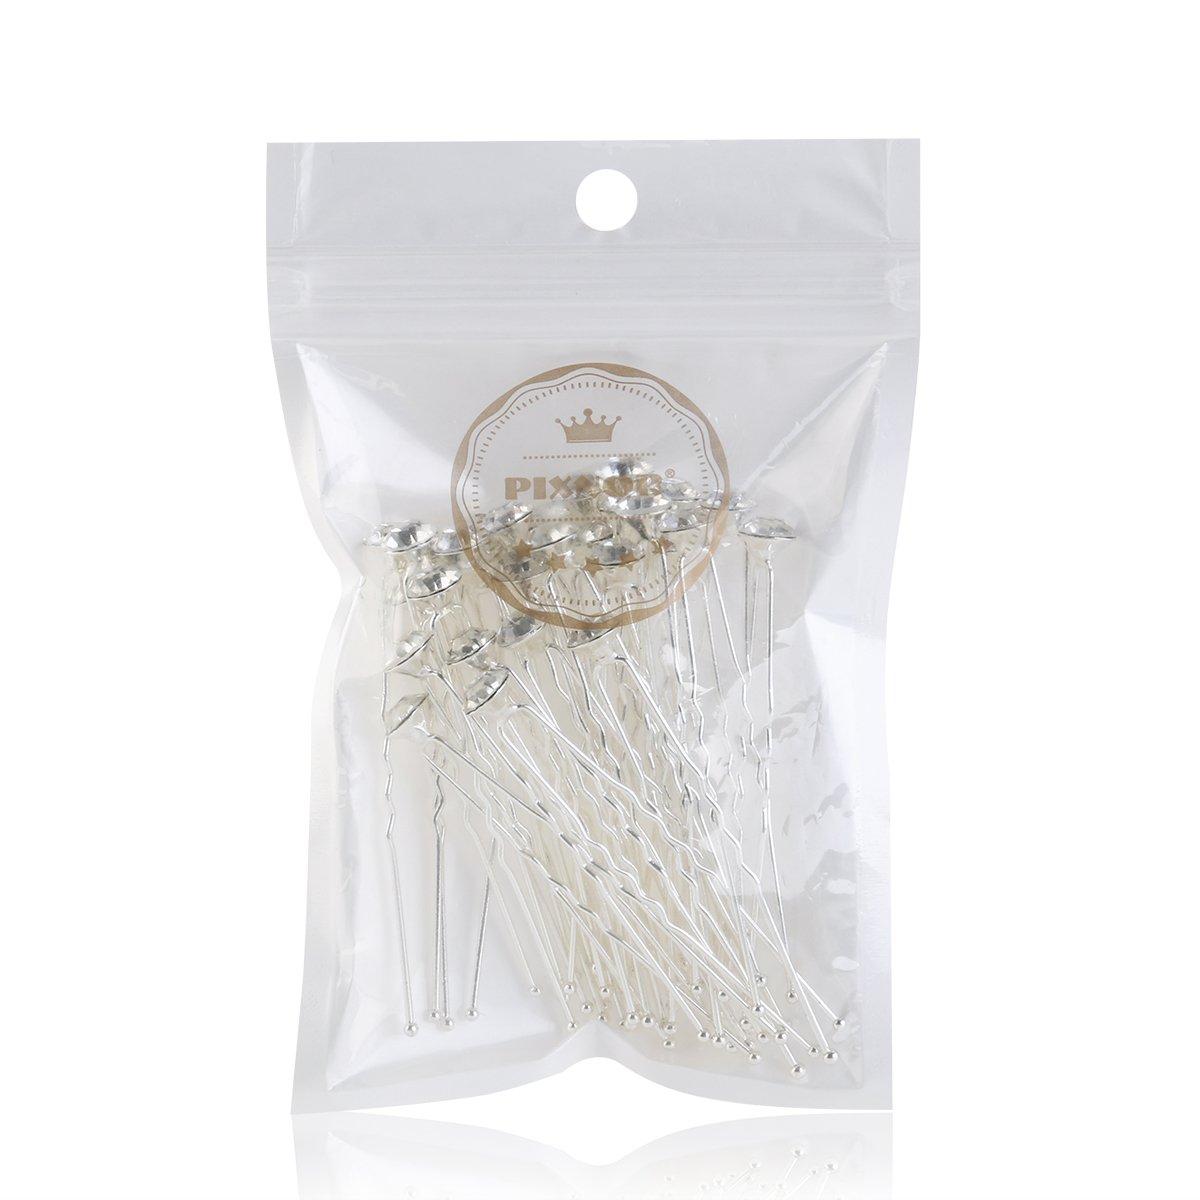 Pixnor 30pcs Pinzas para el Cabello de Boda de Flor del Diamante de Cristal  de Novia ... 7584f7a13d88